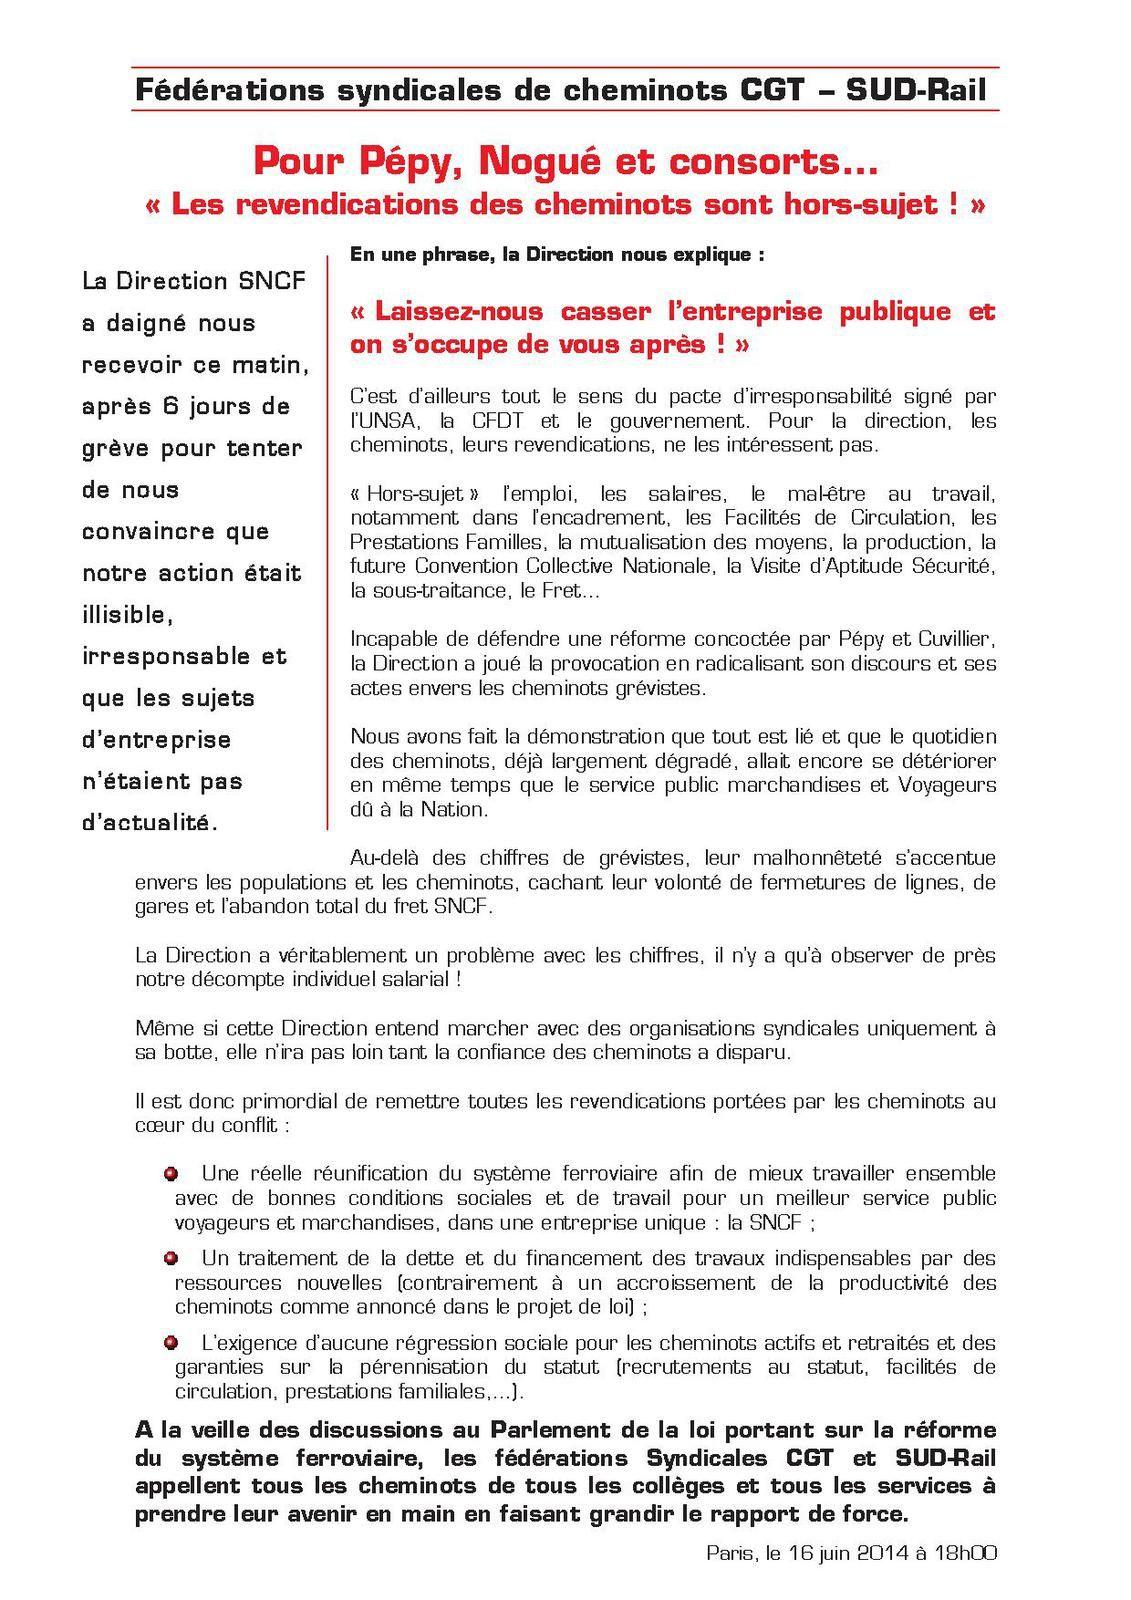 Cheminots, tract interfédéral CGT-Sud Rail du 16 juin